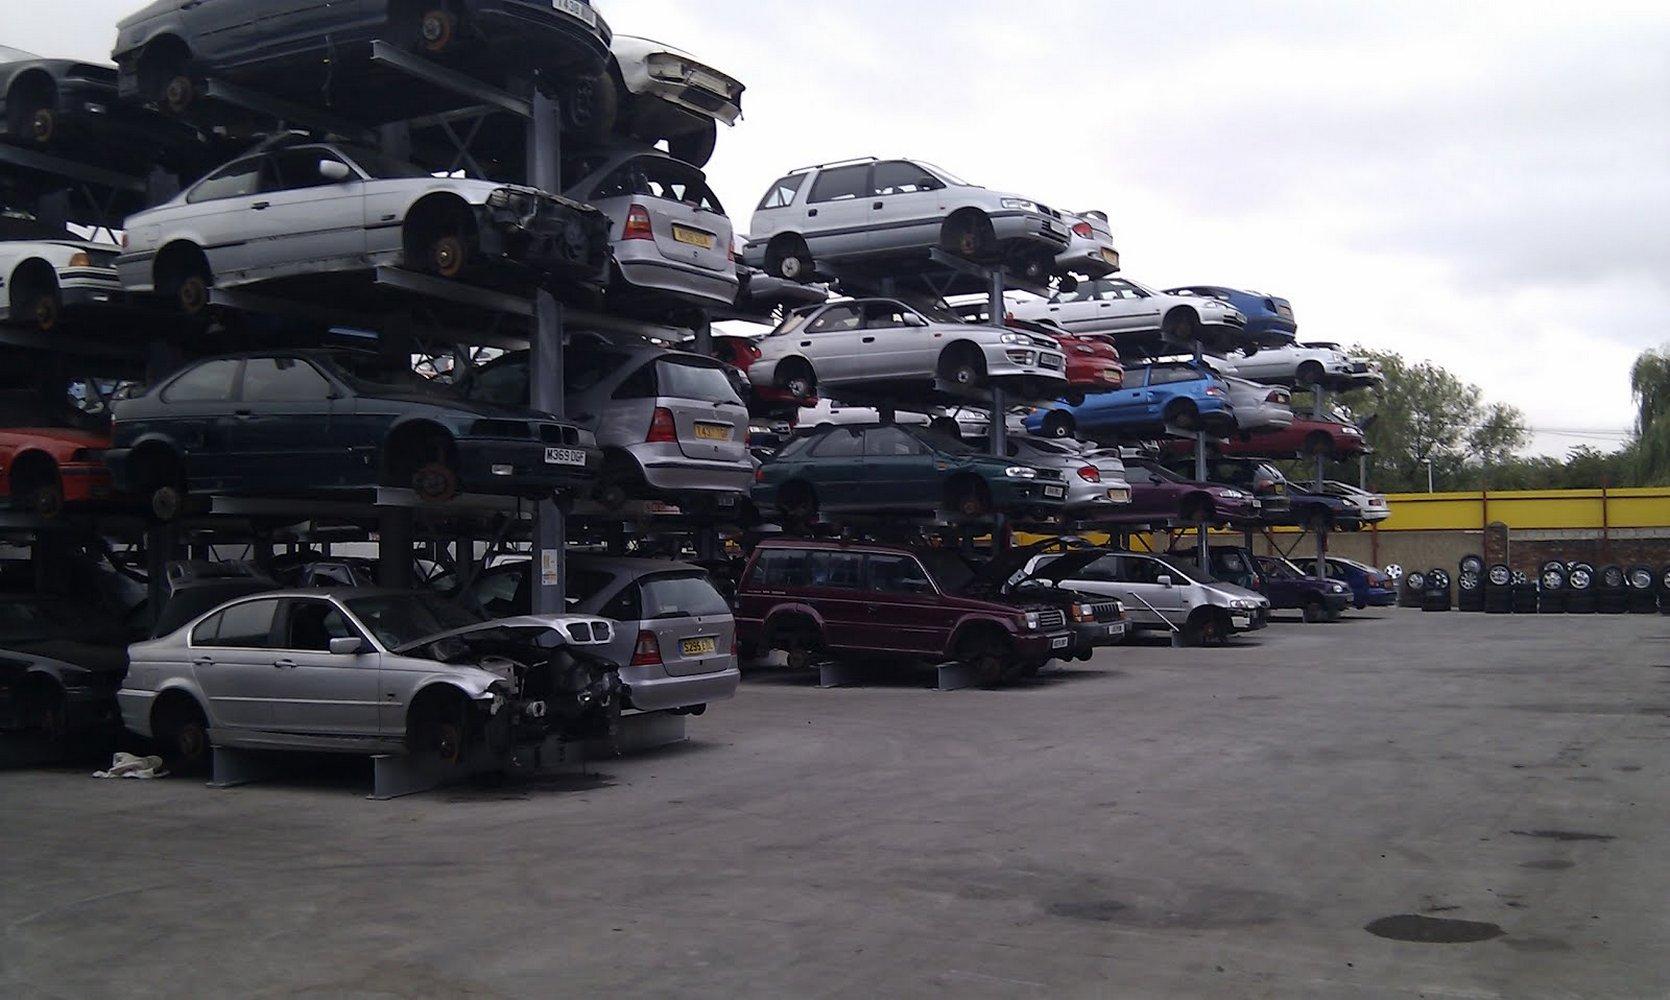 автосвалки японии фото наличии продукции складе